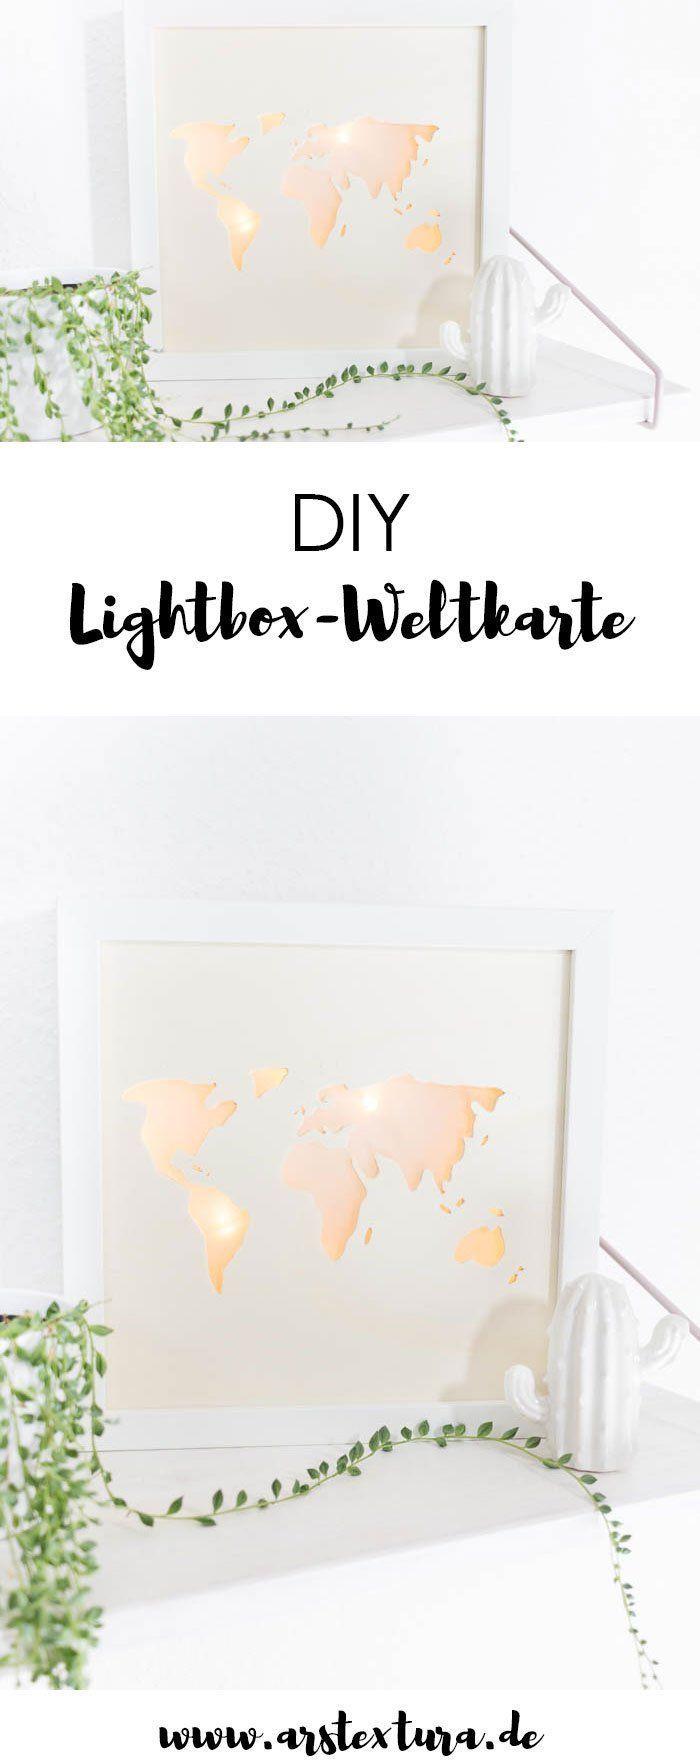 Beleuchtete Weltkarte – DIY Lightbox basteln | ars textura – DIY-Blog